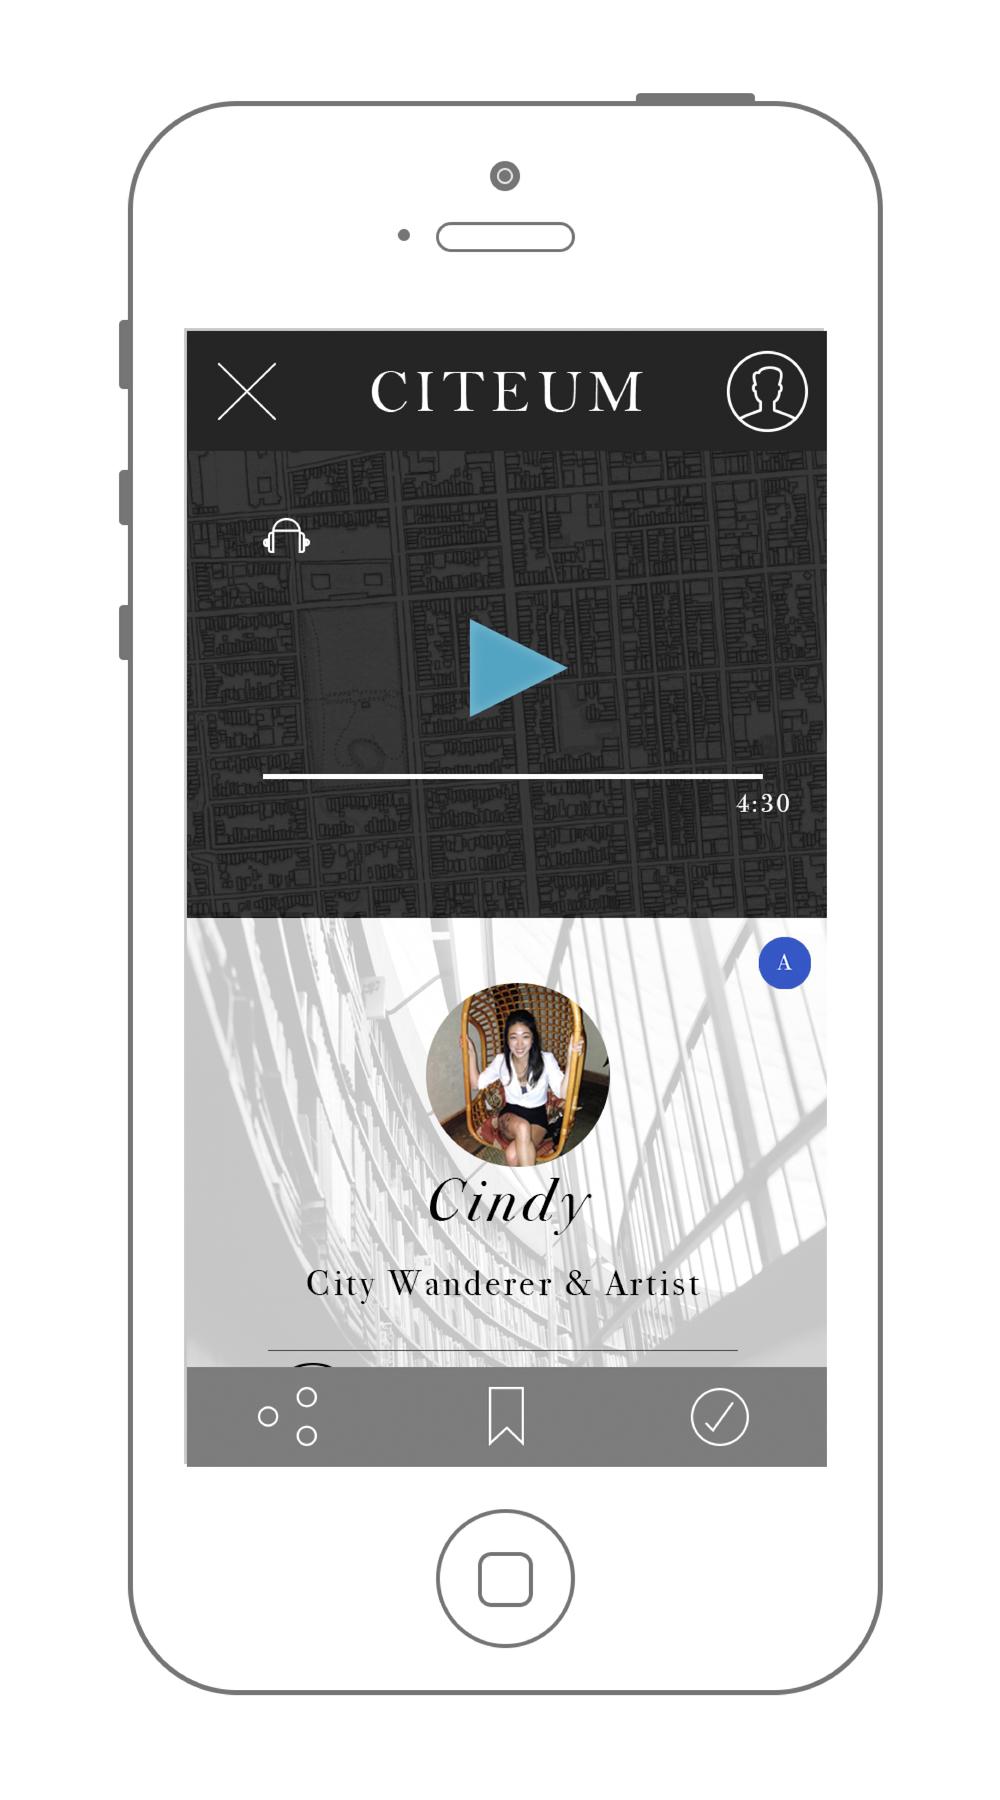 Citeum_audiotour.jpg